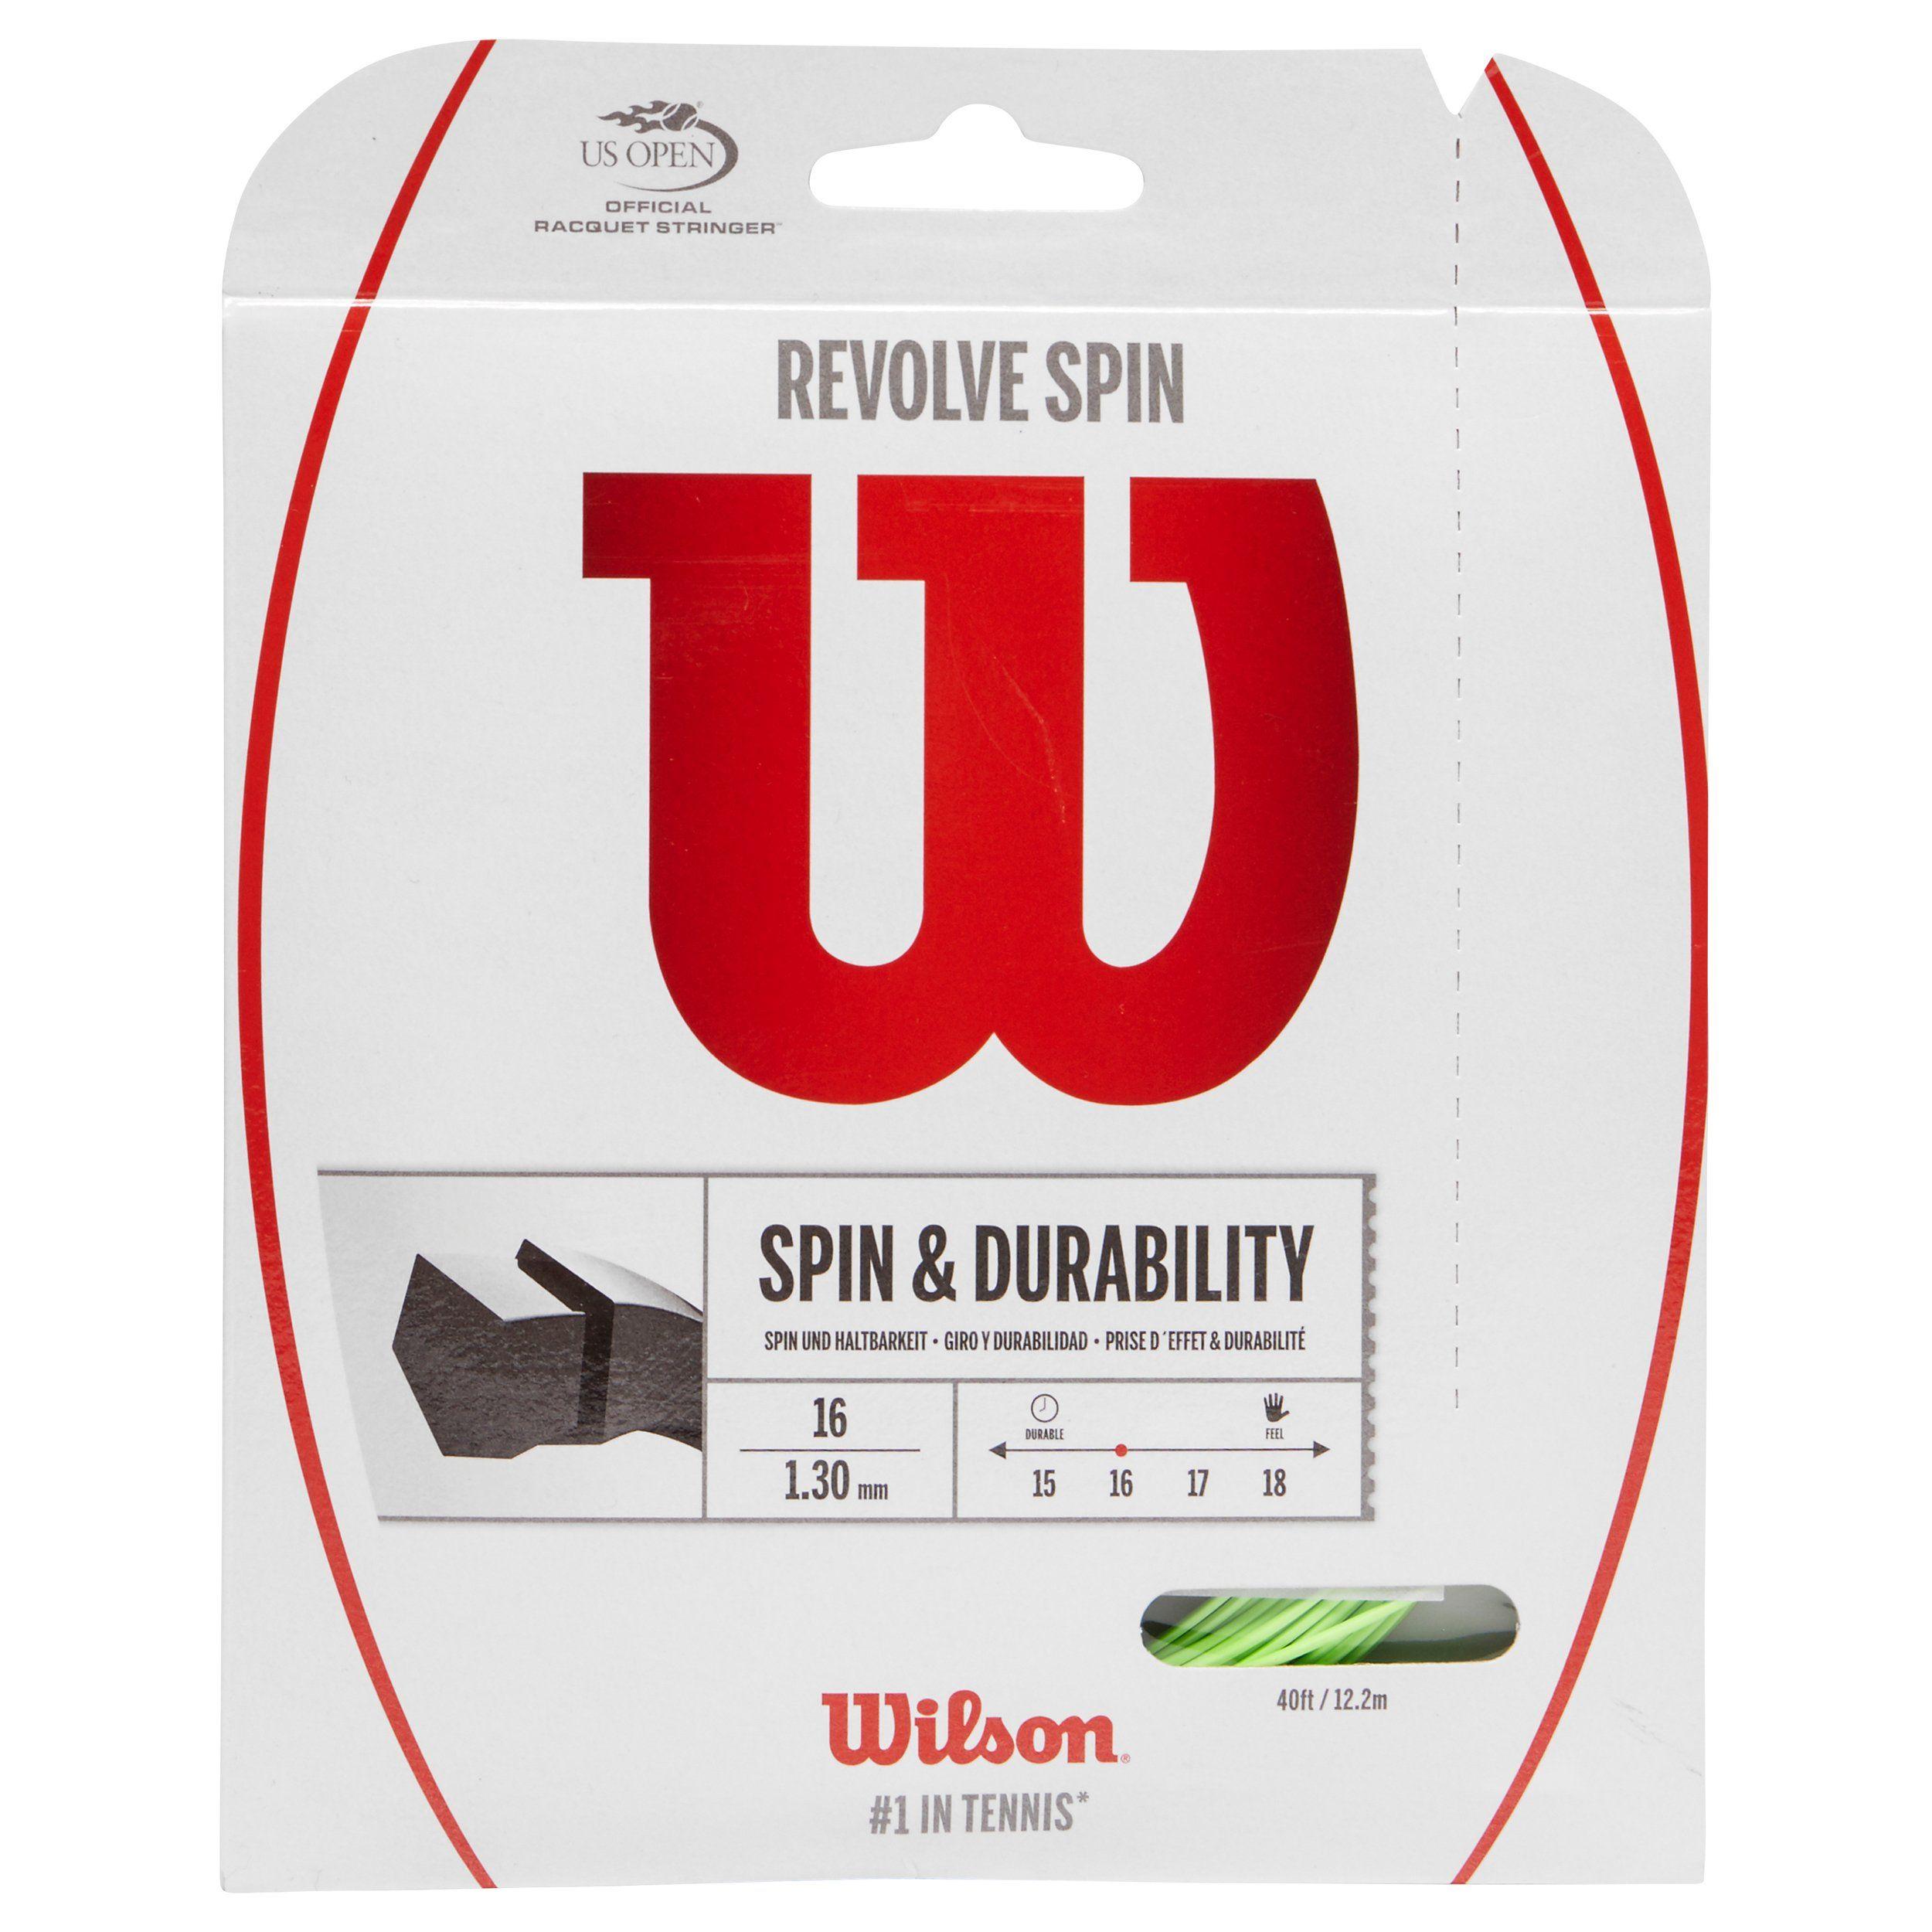 Wilson Revolve Spin String (12.2m)